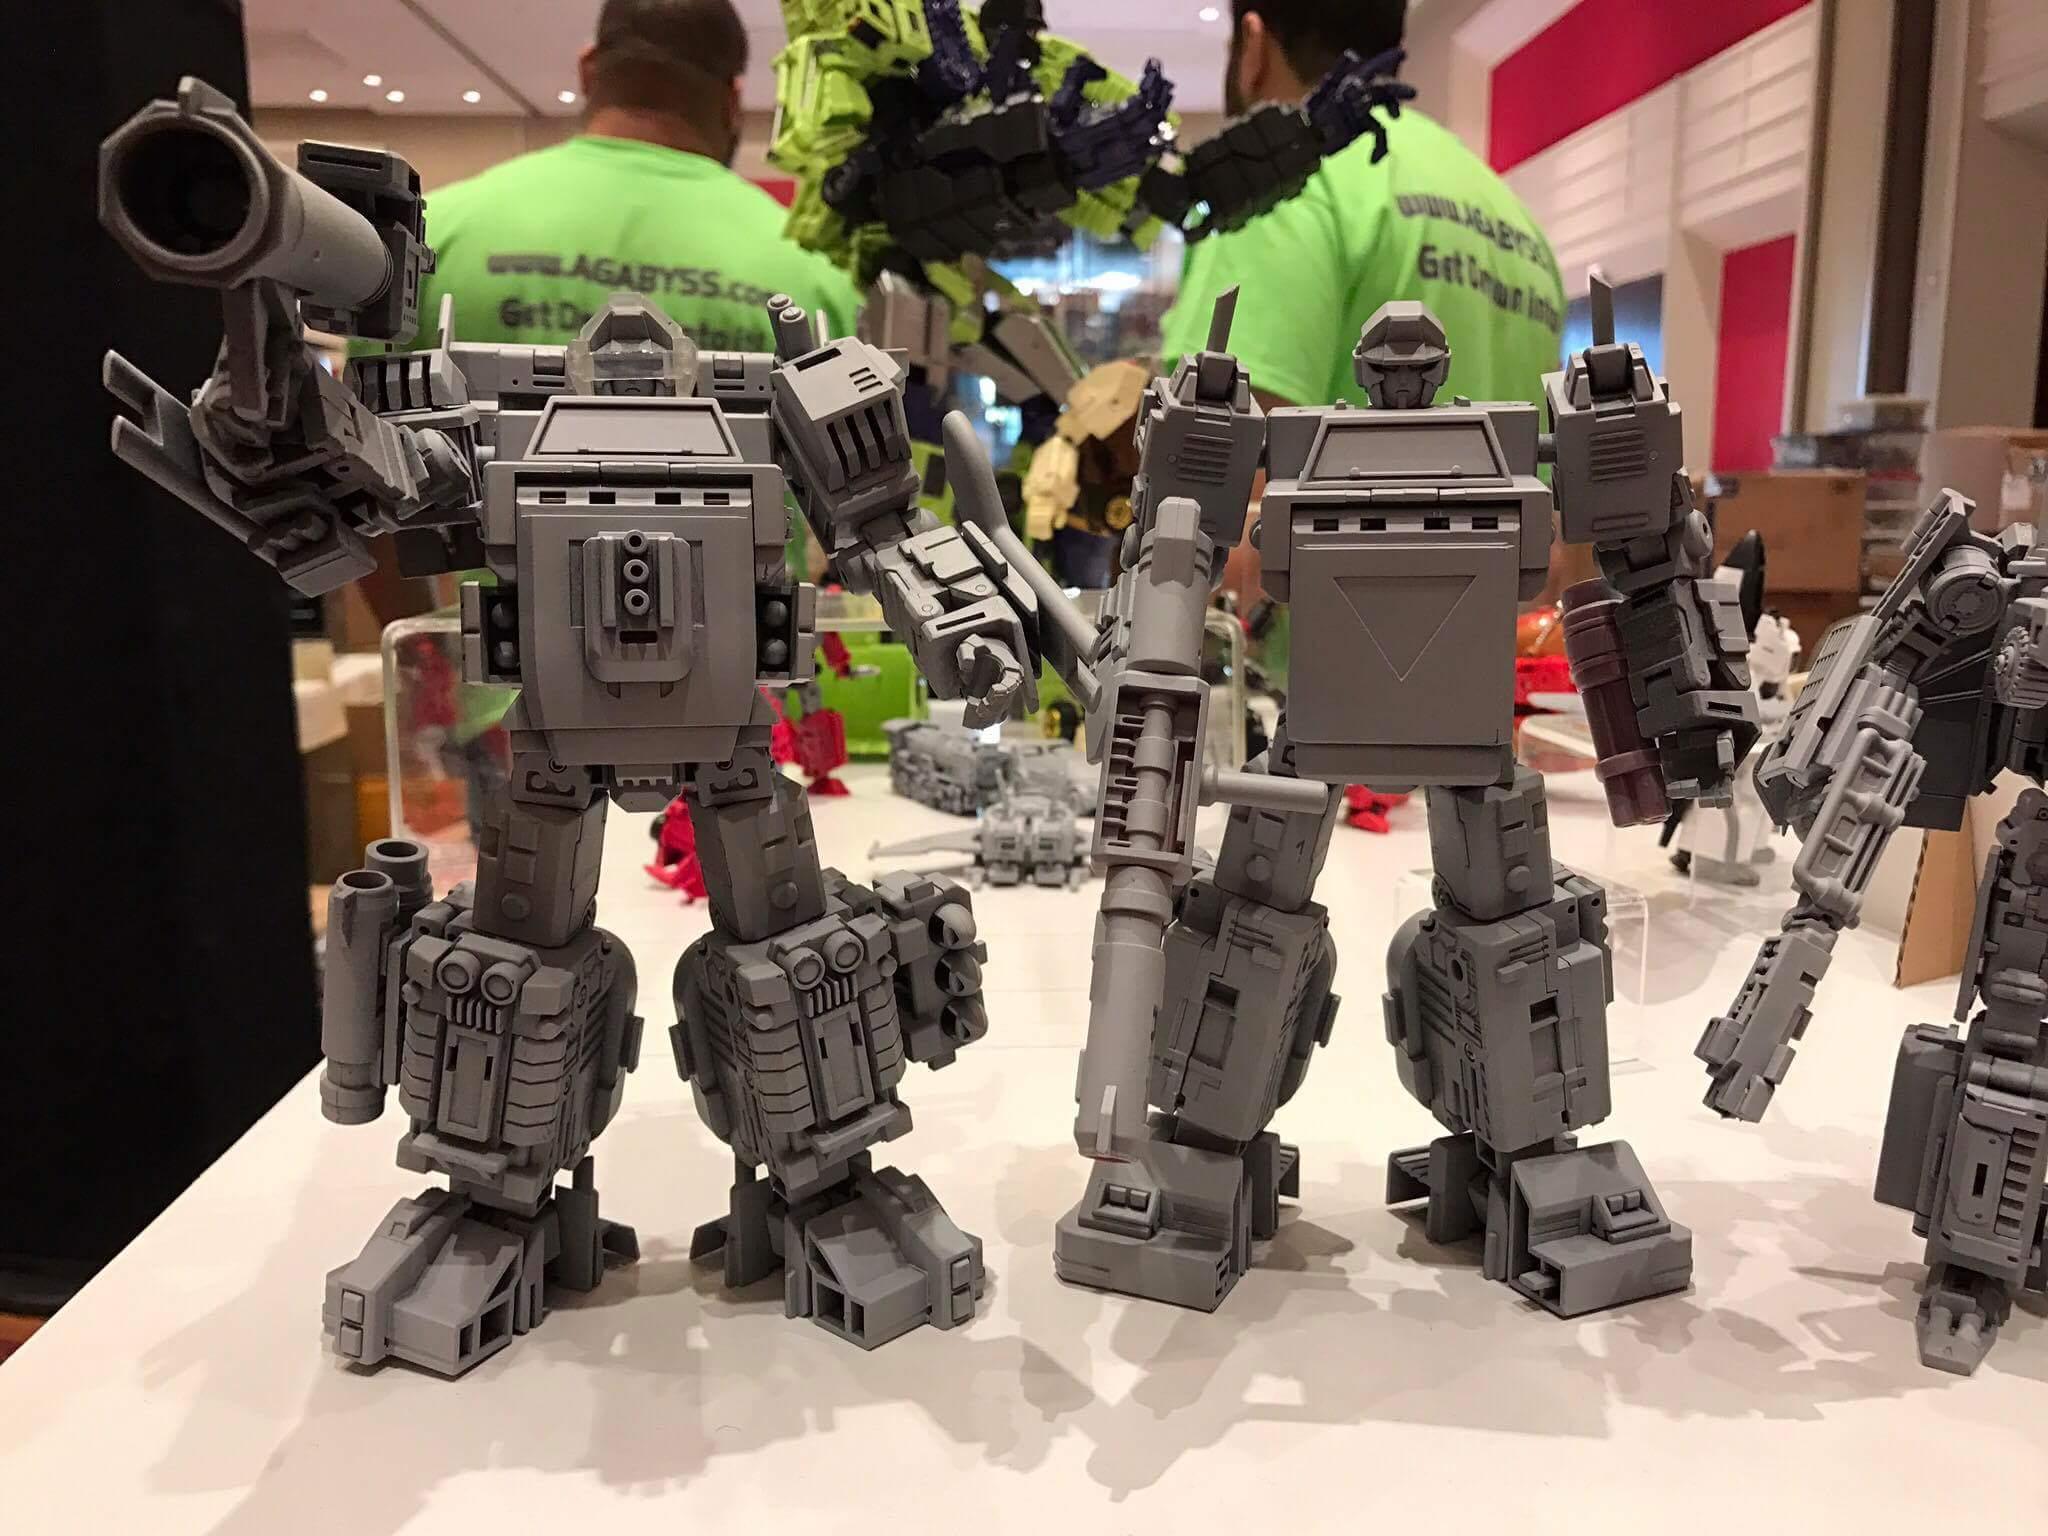 [Dessin Animé + Jouets] Gobots — Machine Robo - Page 5 TcQ1mnLh